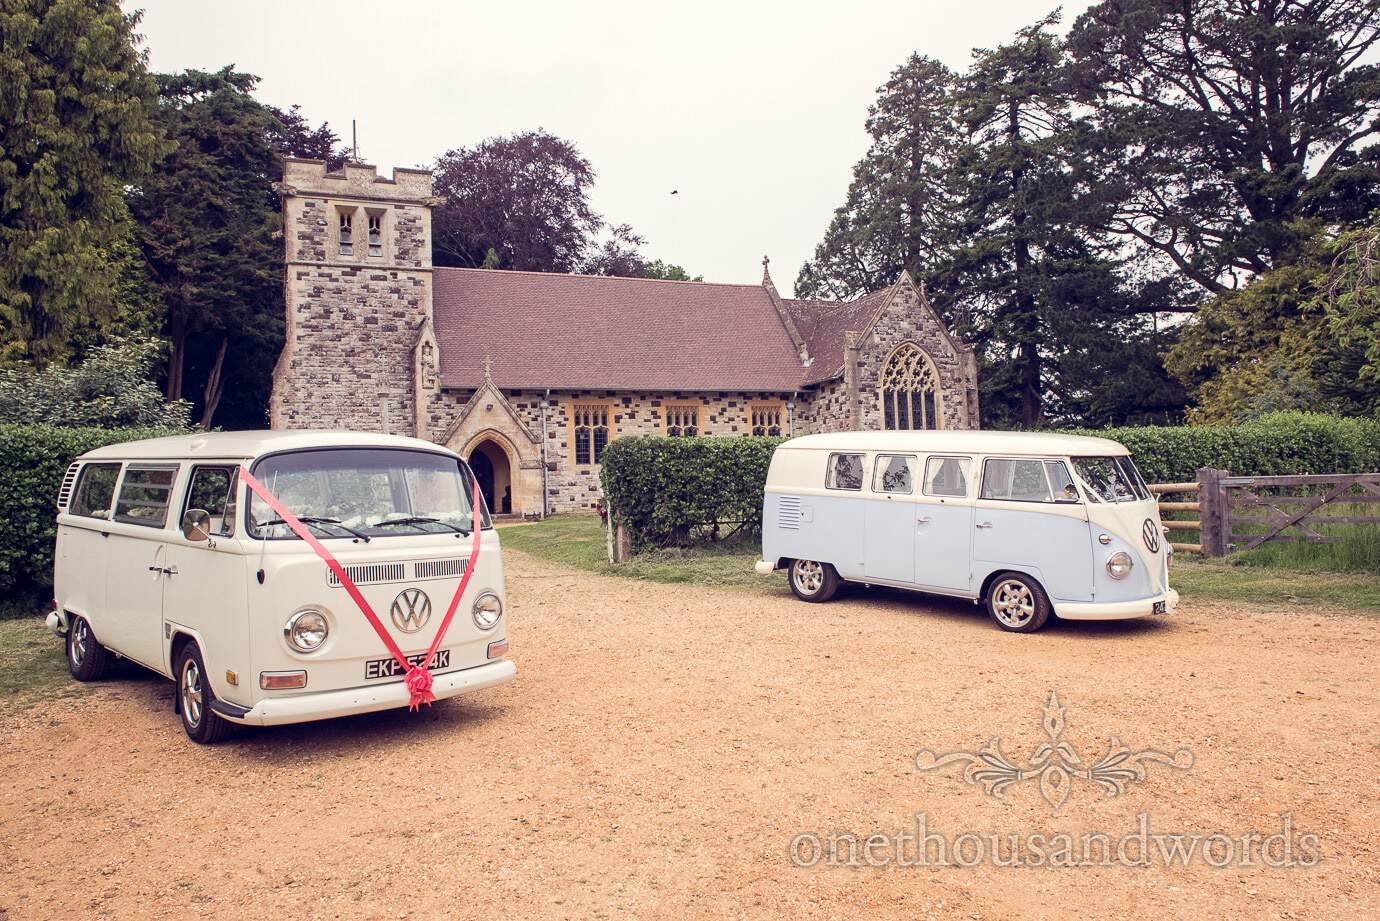 VW wedding camper vans with wedding ribbons at Dorset Church wedding